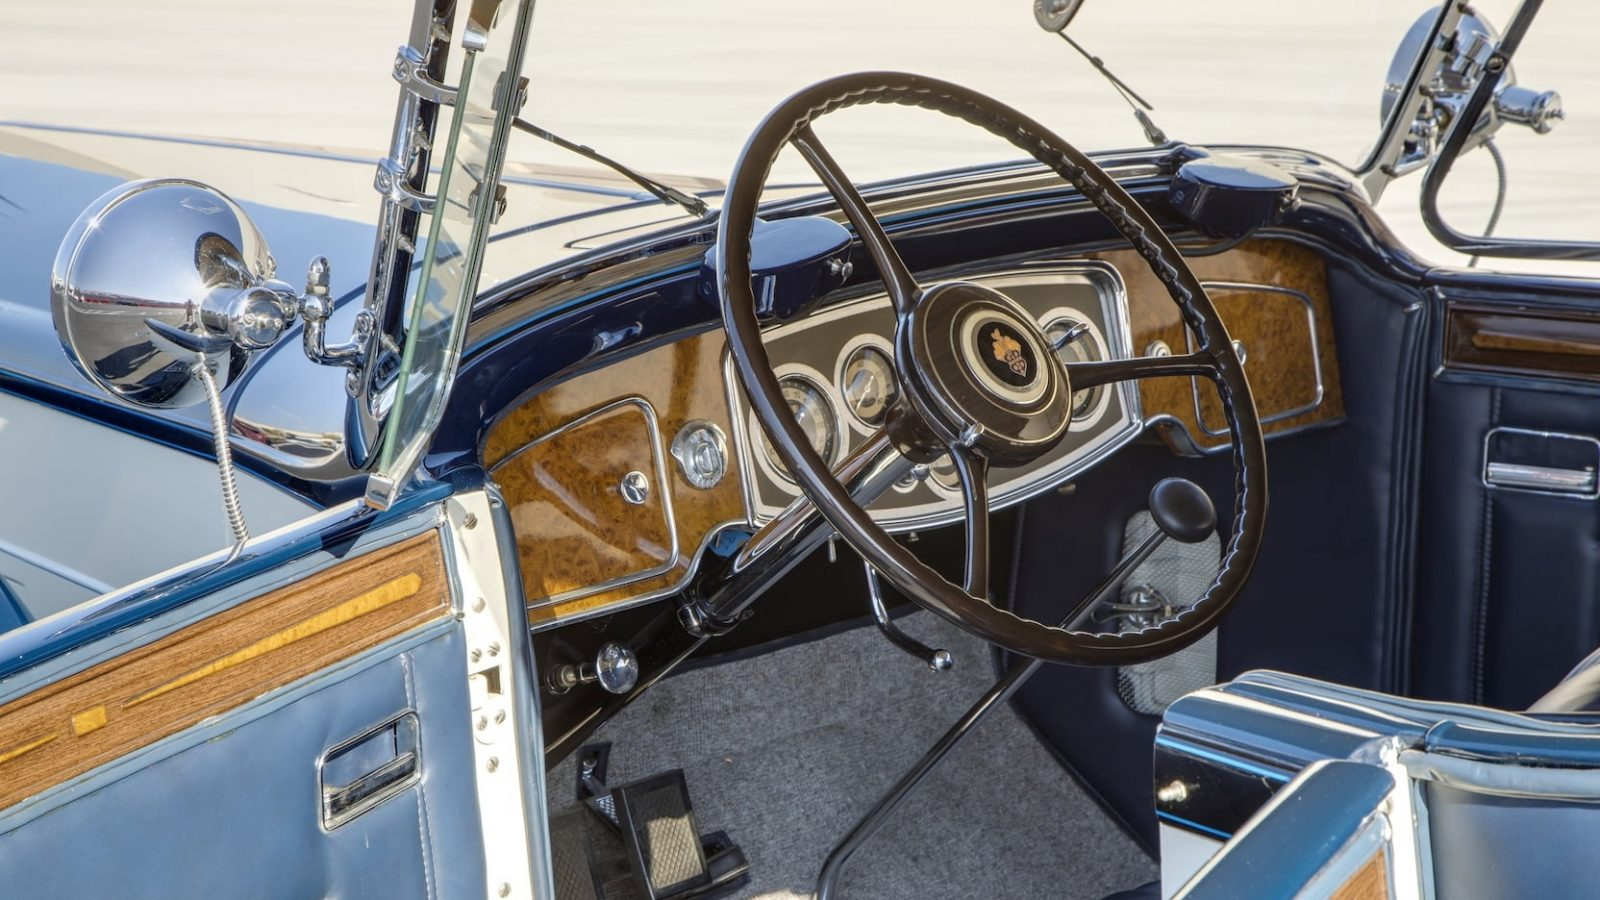 1933 PACKARD 1005 TWELVE TOURING